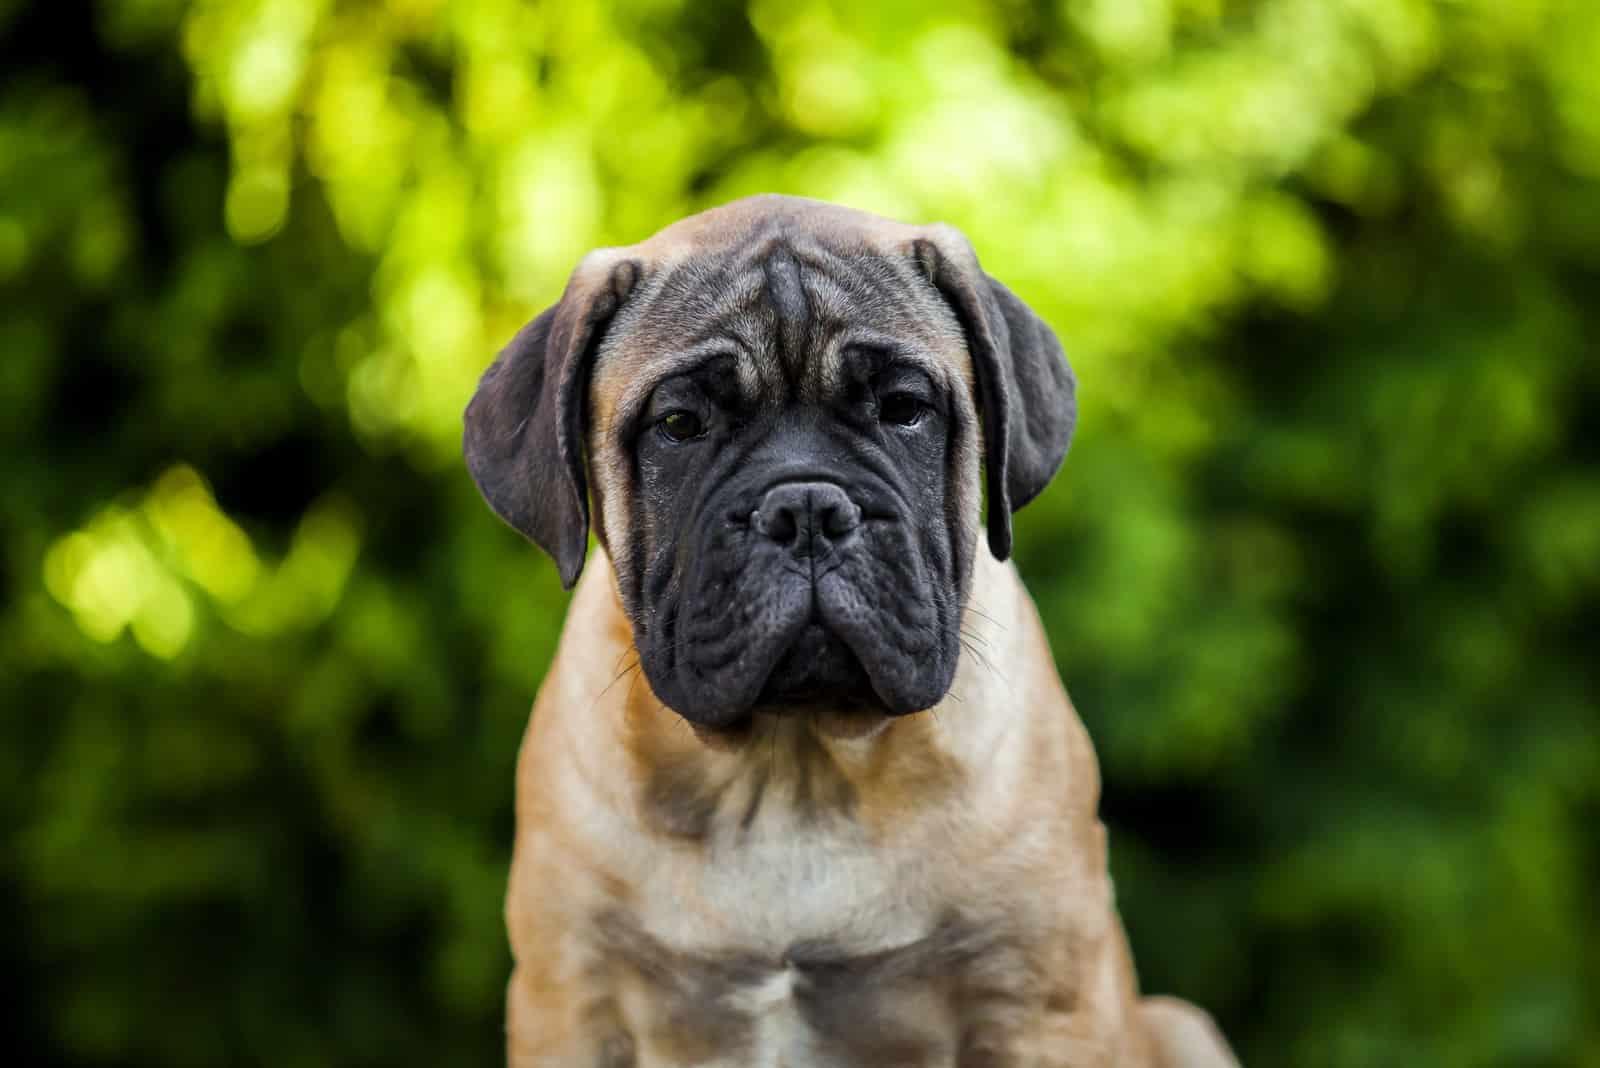 Bullmastiff puppy outdoor